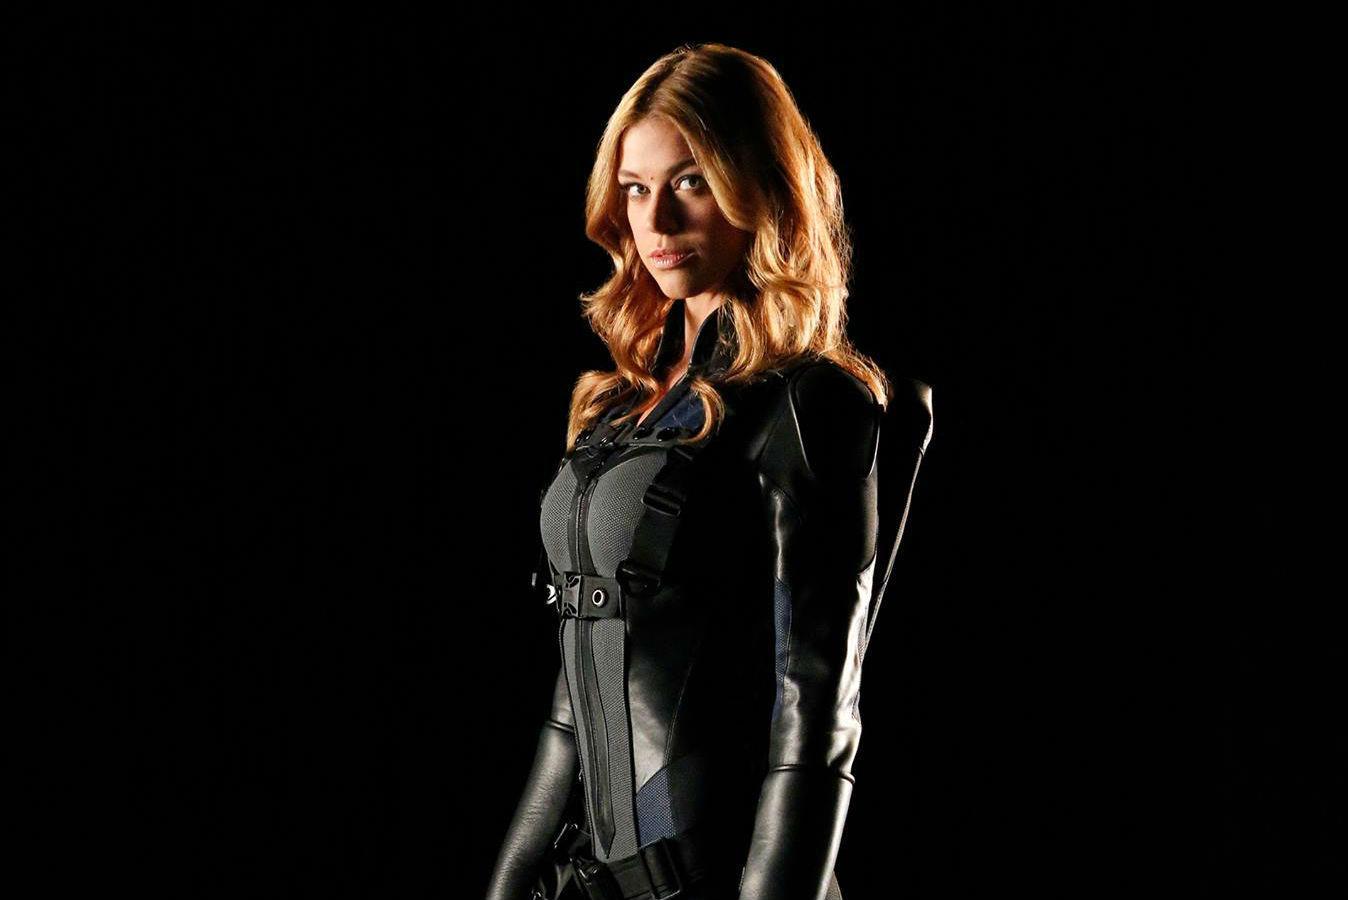 Marvel's Agents of S.H.I.E.L.D. gets a spinoff series ...